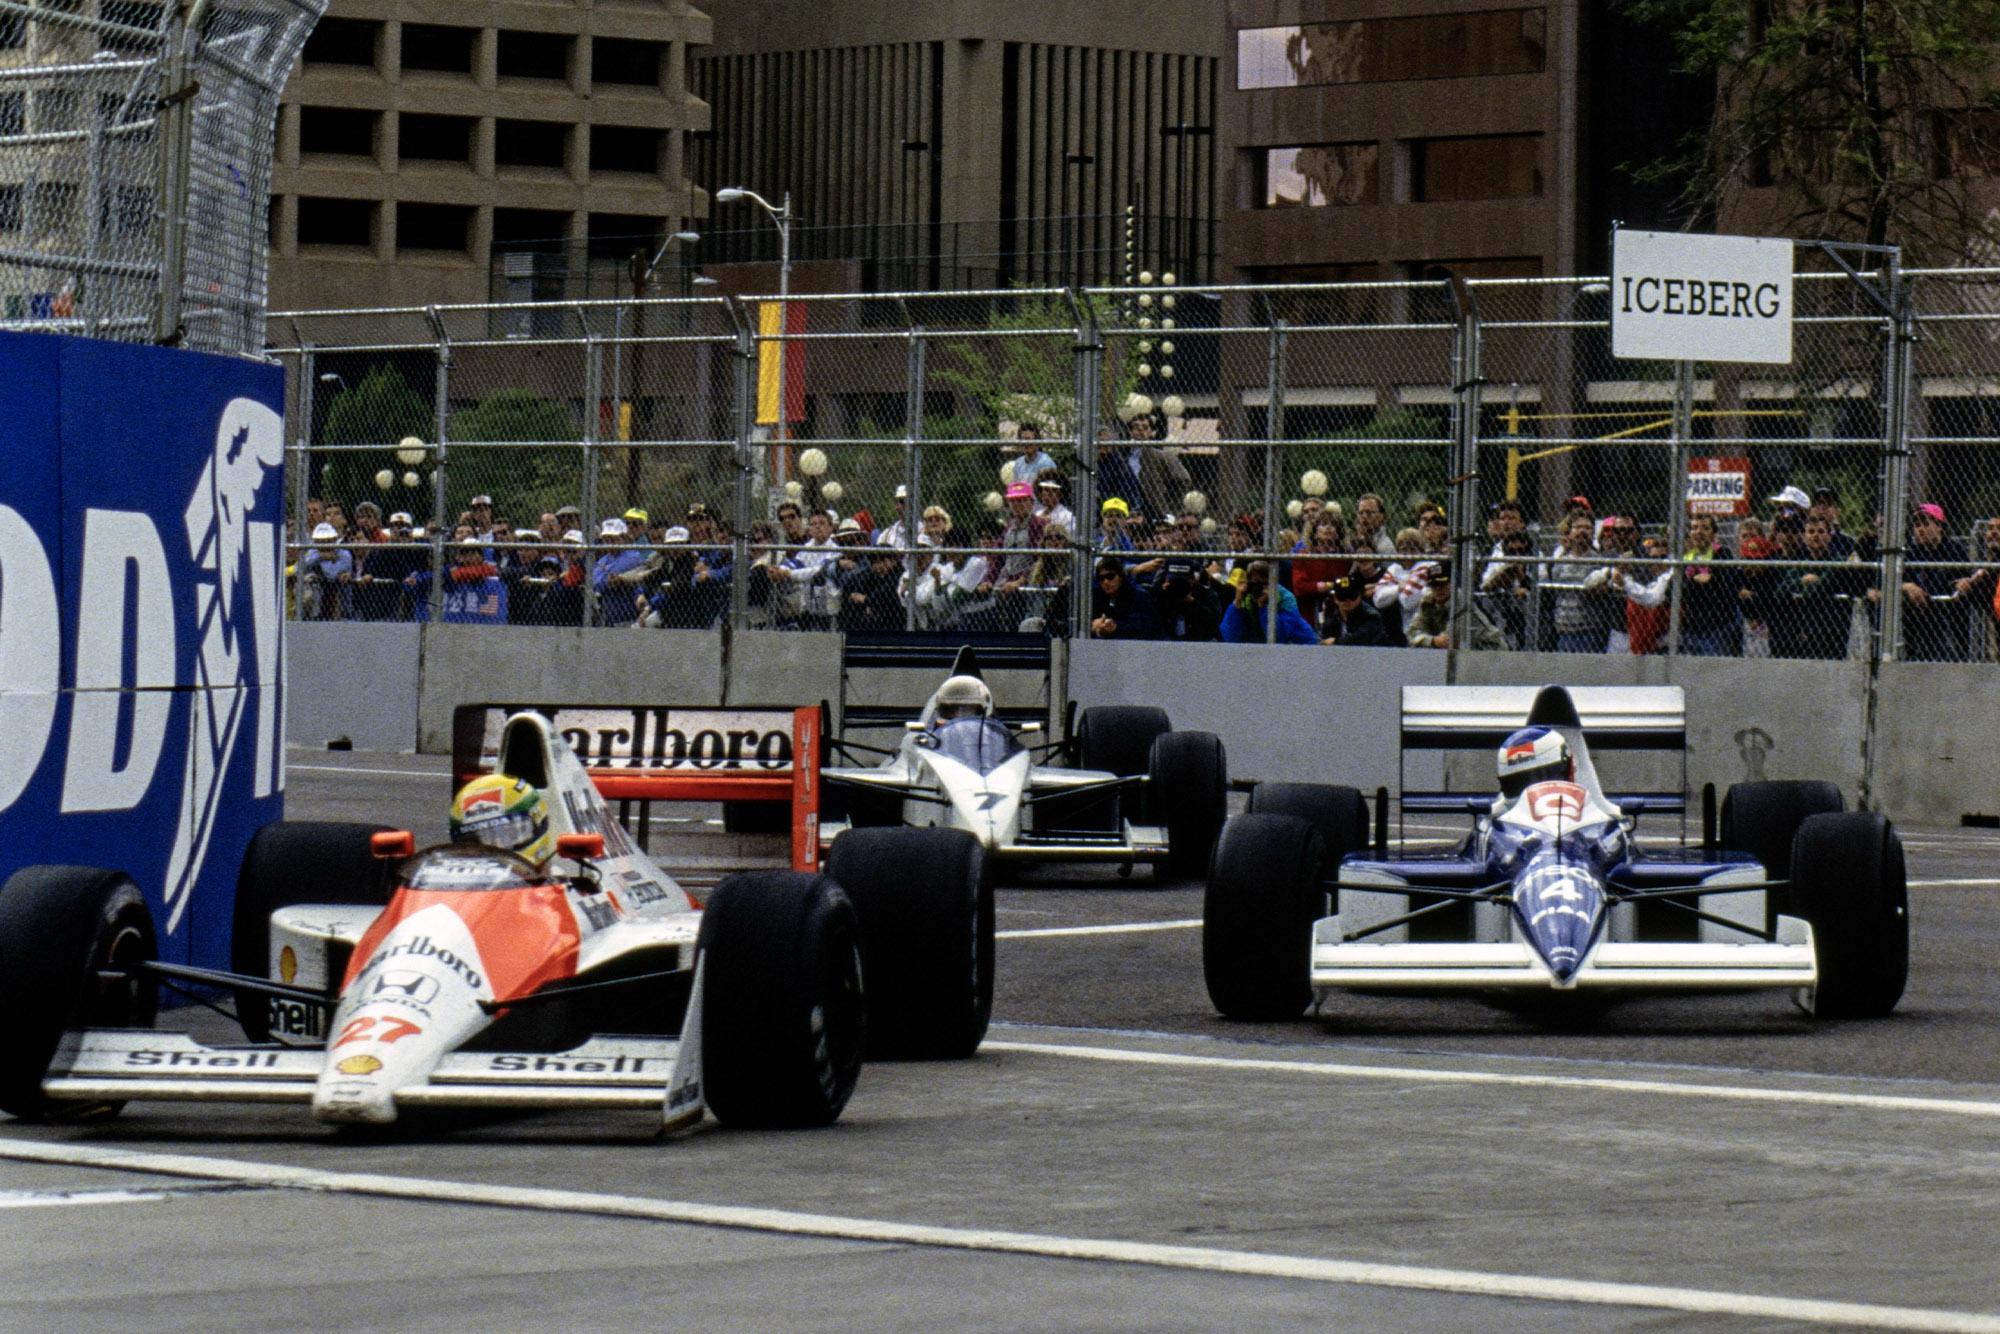 Ayrton Senna and Jean Alesi